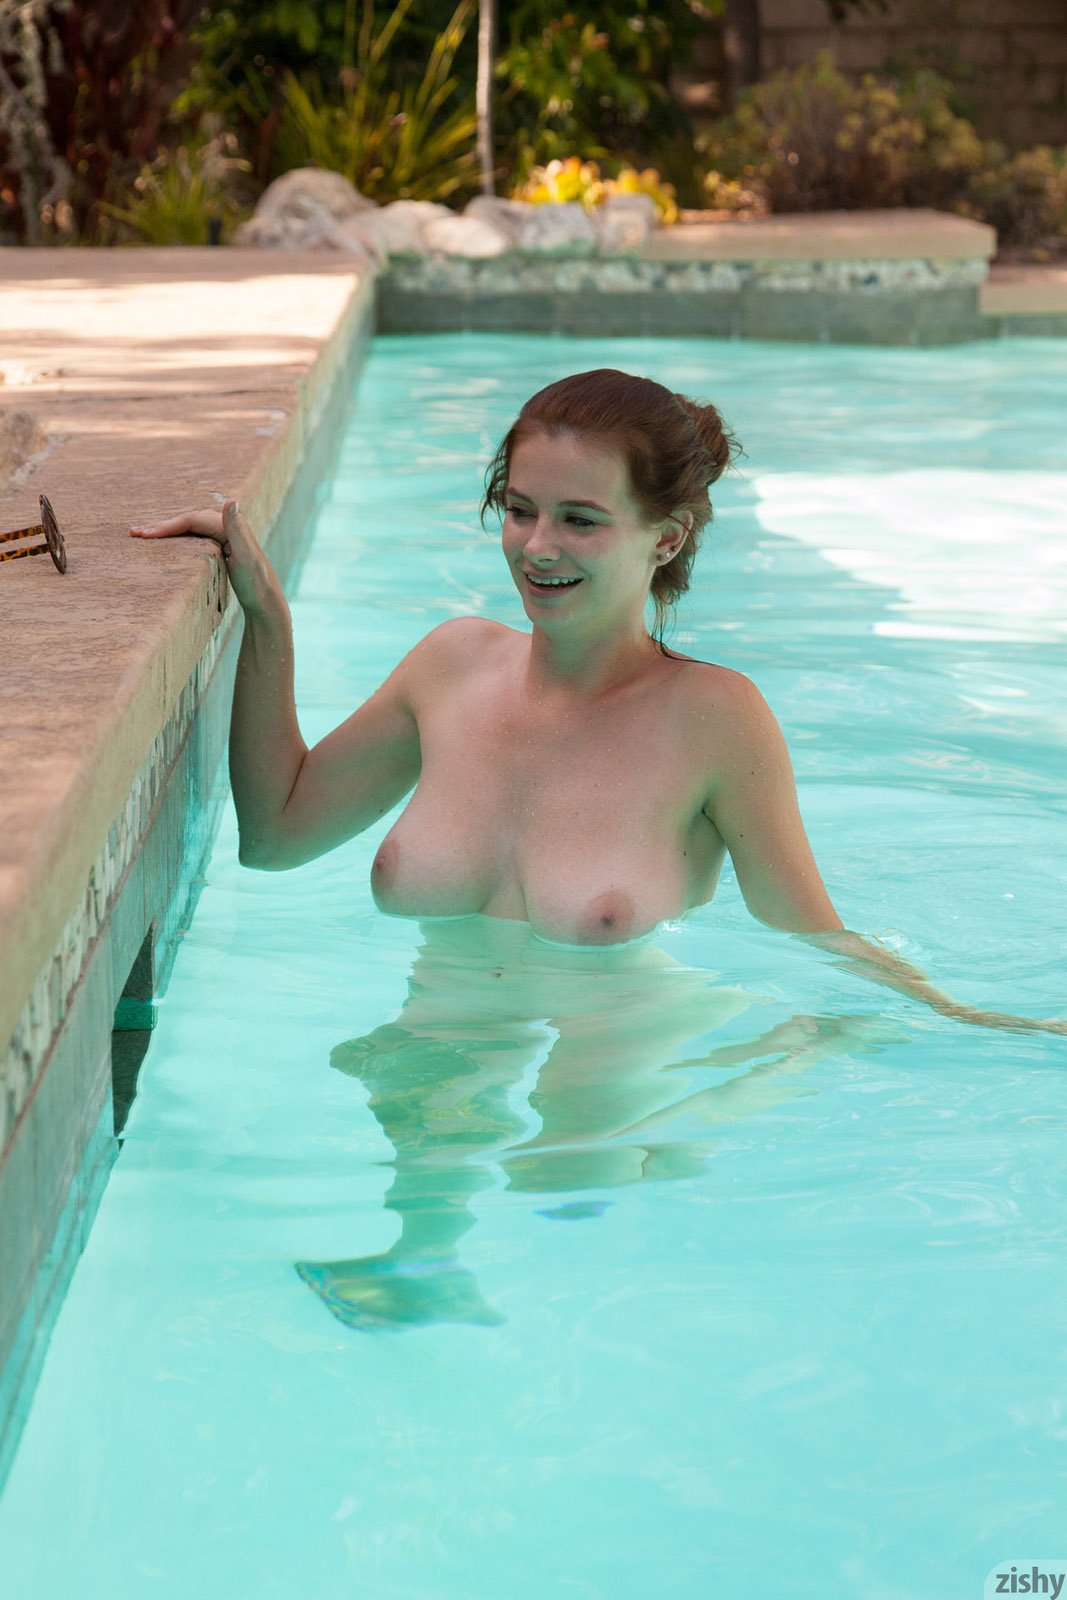 Essie Halladay Skinny Dipping Zishy nude pics  Bunnylustcom